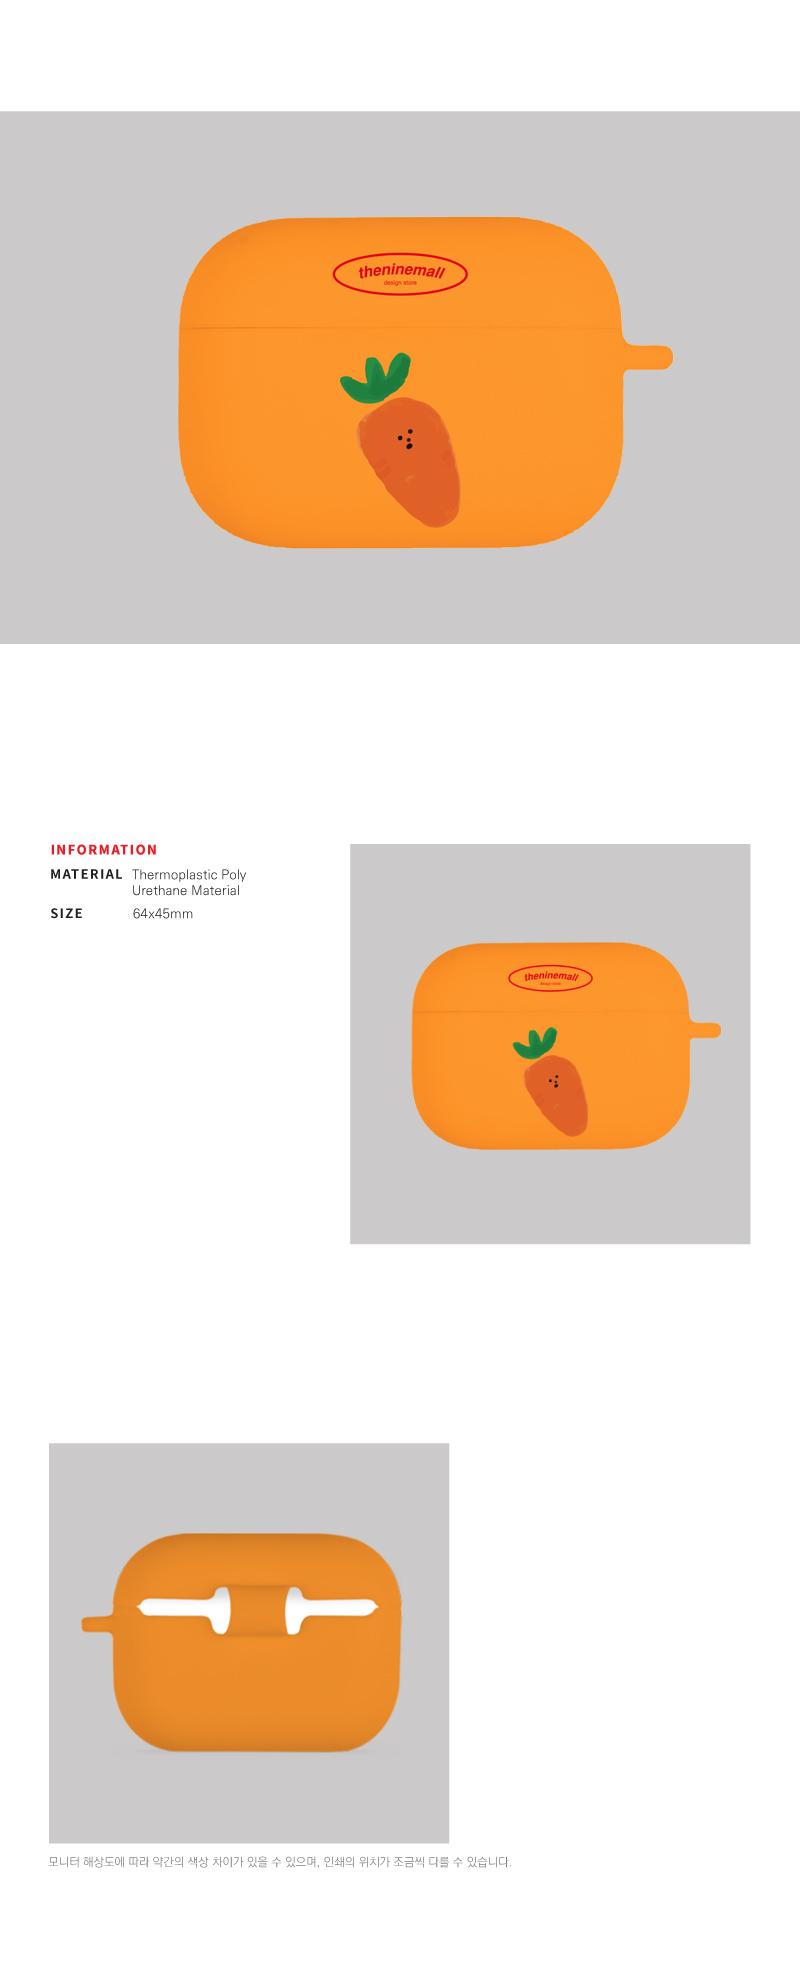 carrot [에어팟 프로][orange] - 주식회사 모먼트디자인, 9,000원, 케이스, 에어팟